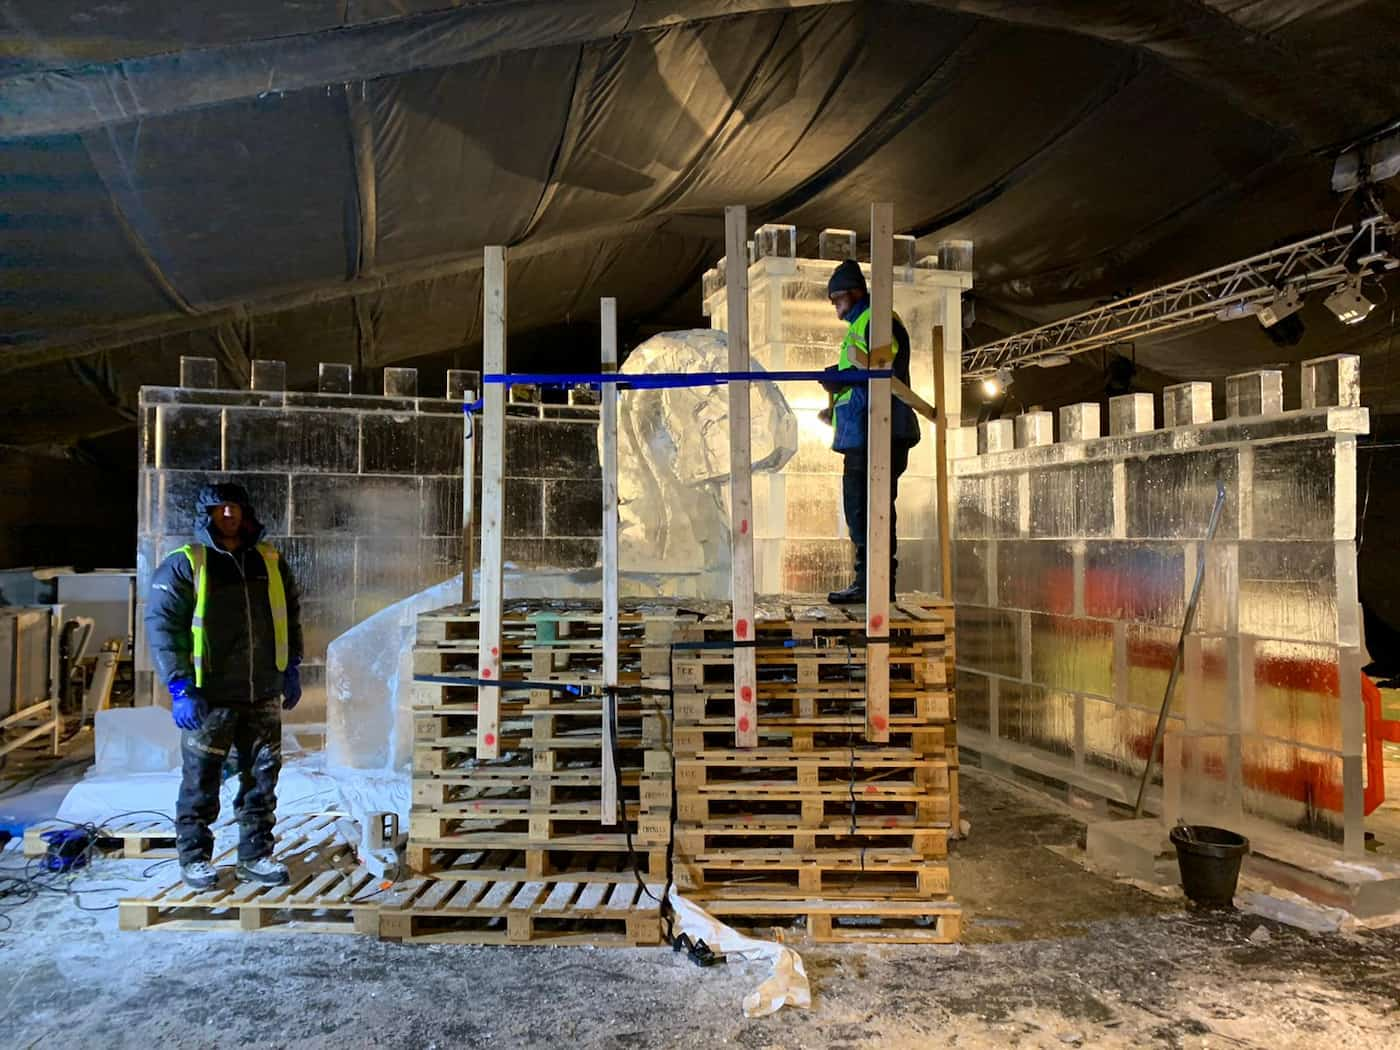 Christmas, Ice Rinks & Ice Sculpture Experiences 7